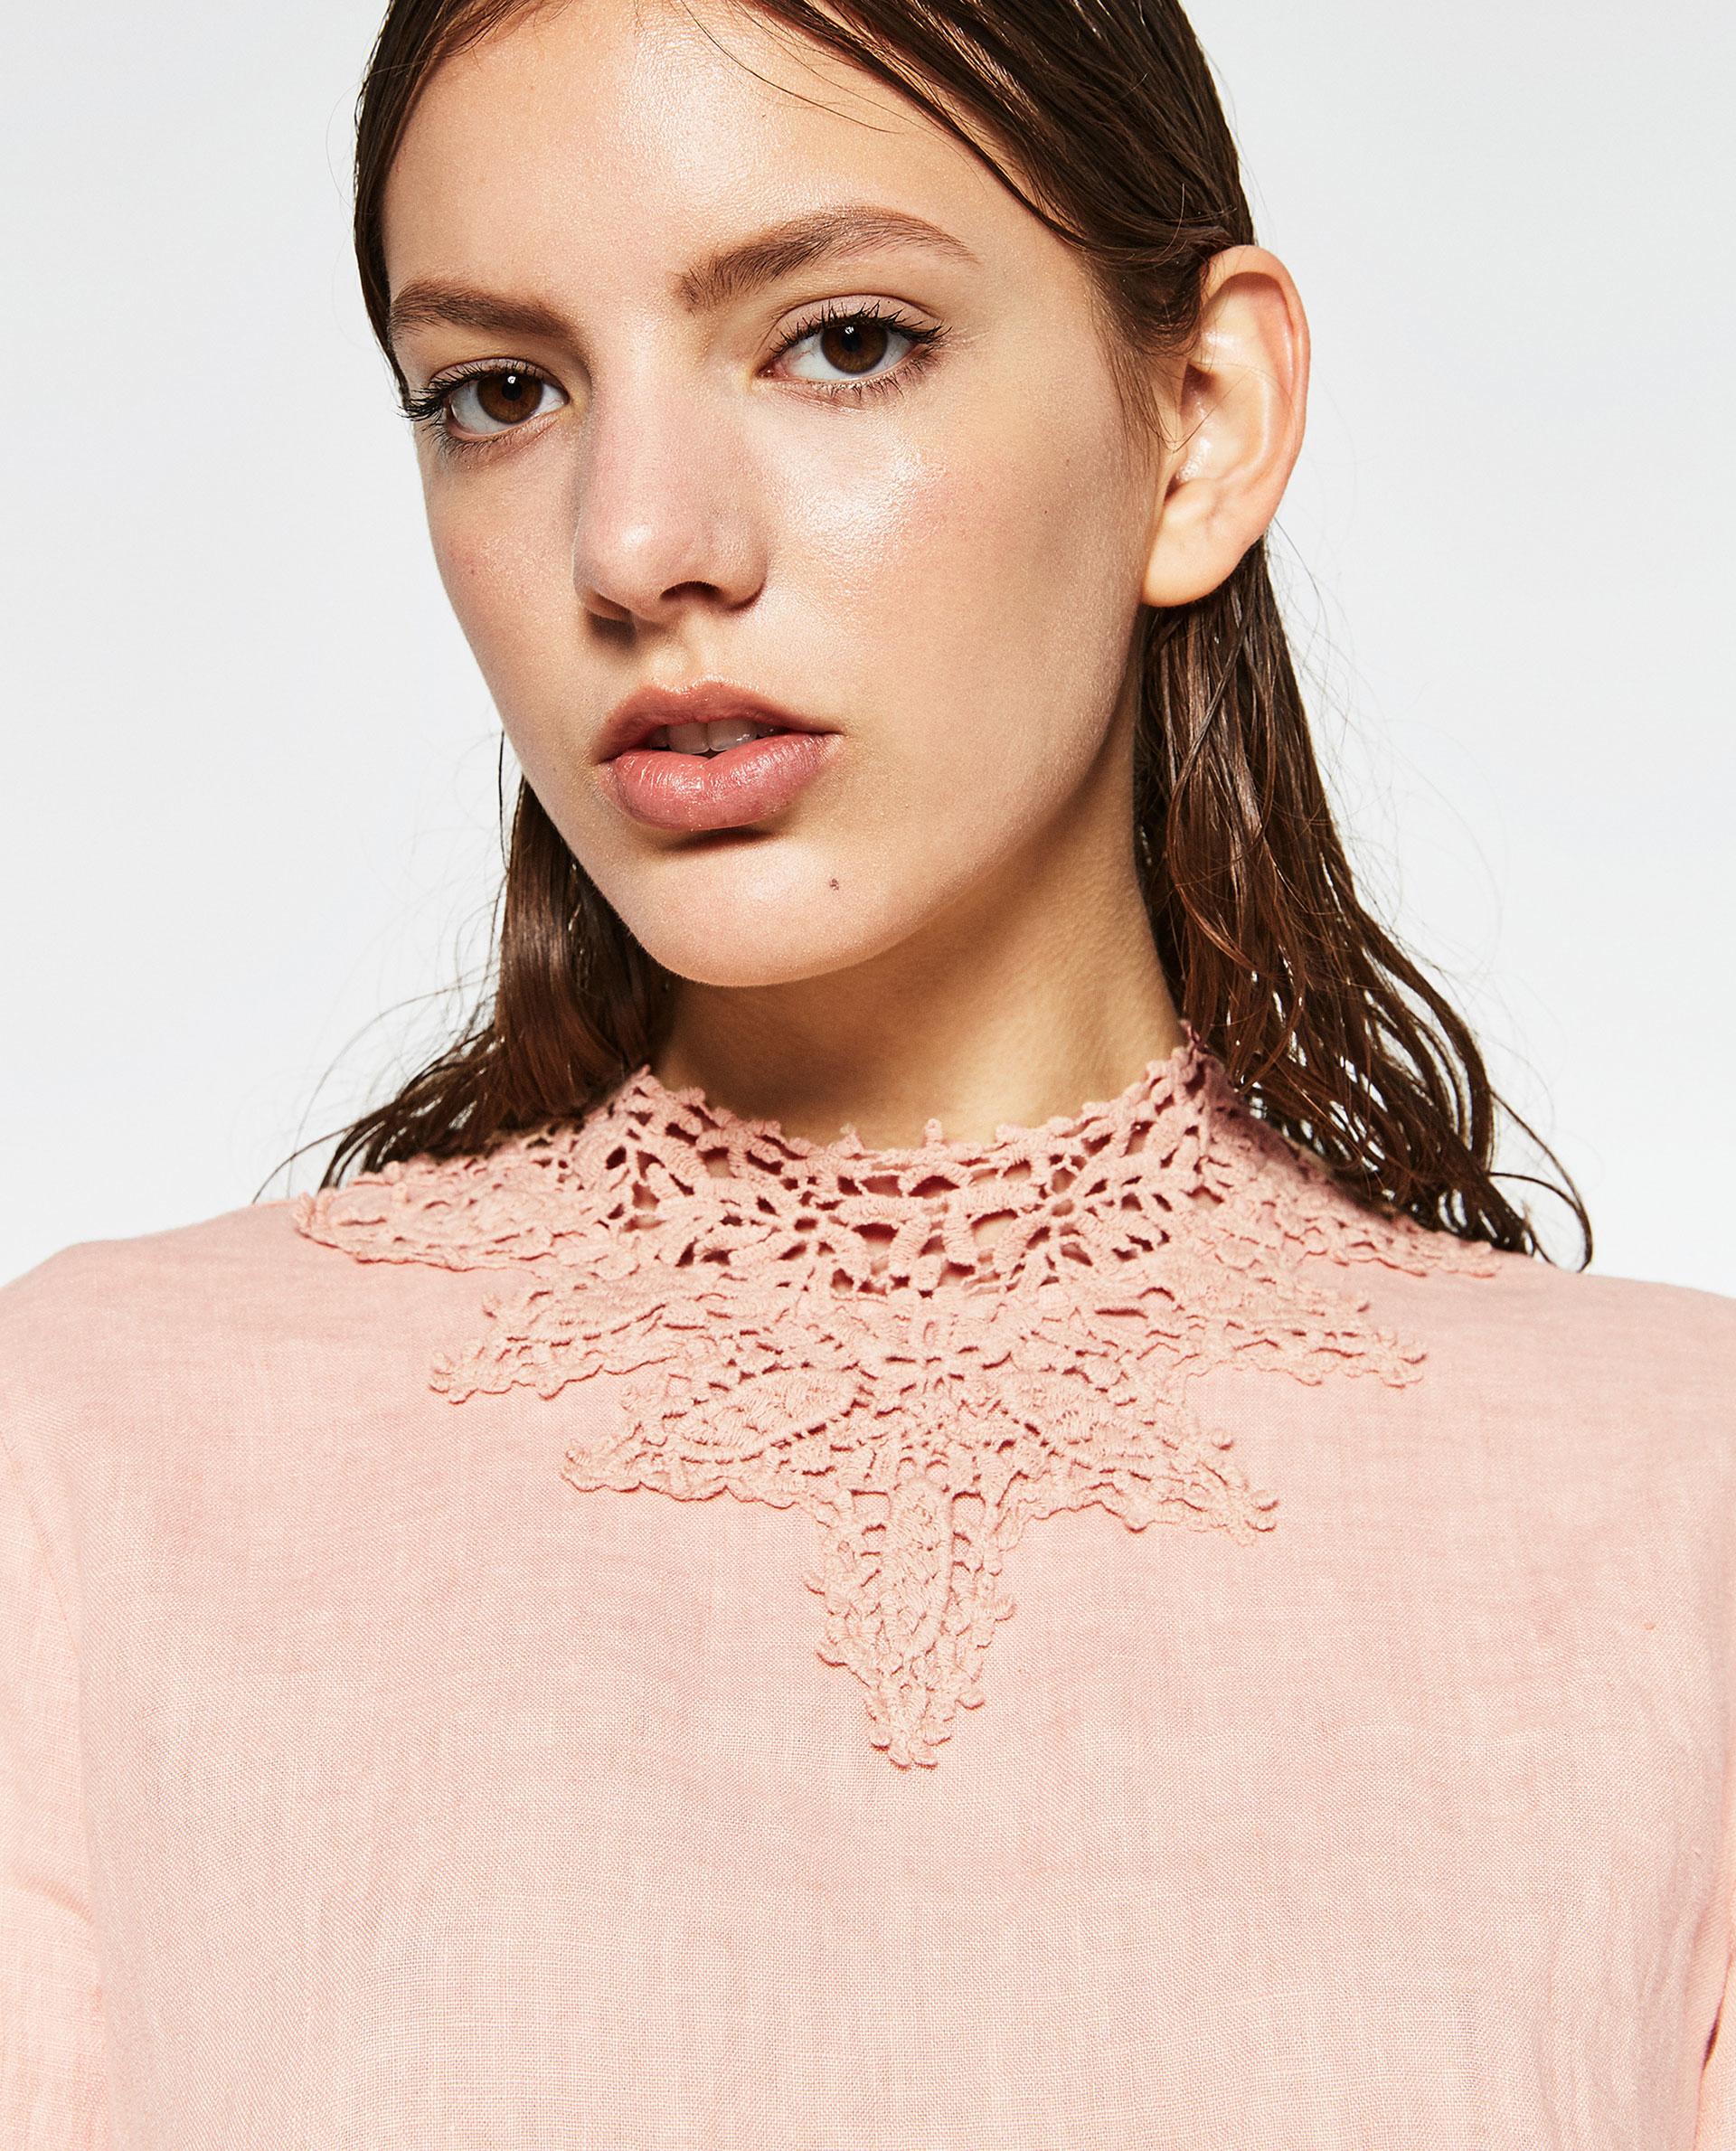 Zara Linen Blouse 108